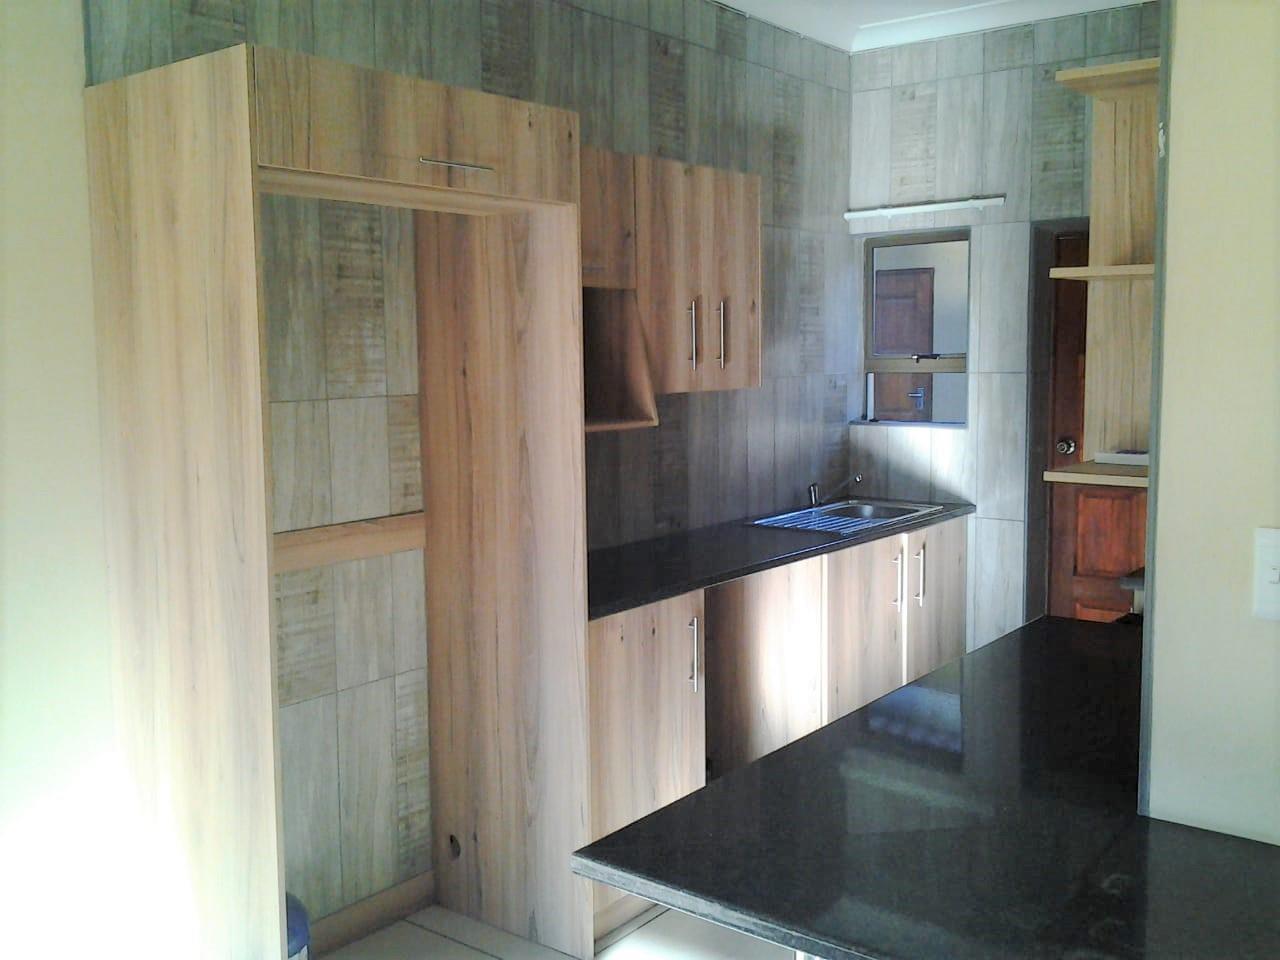 Townhouse Rental Monthly in Kookrus